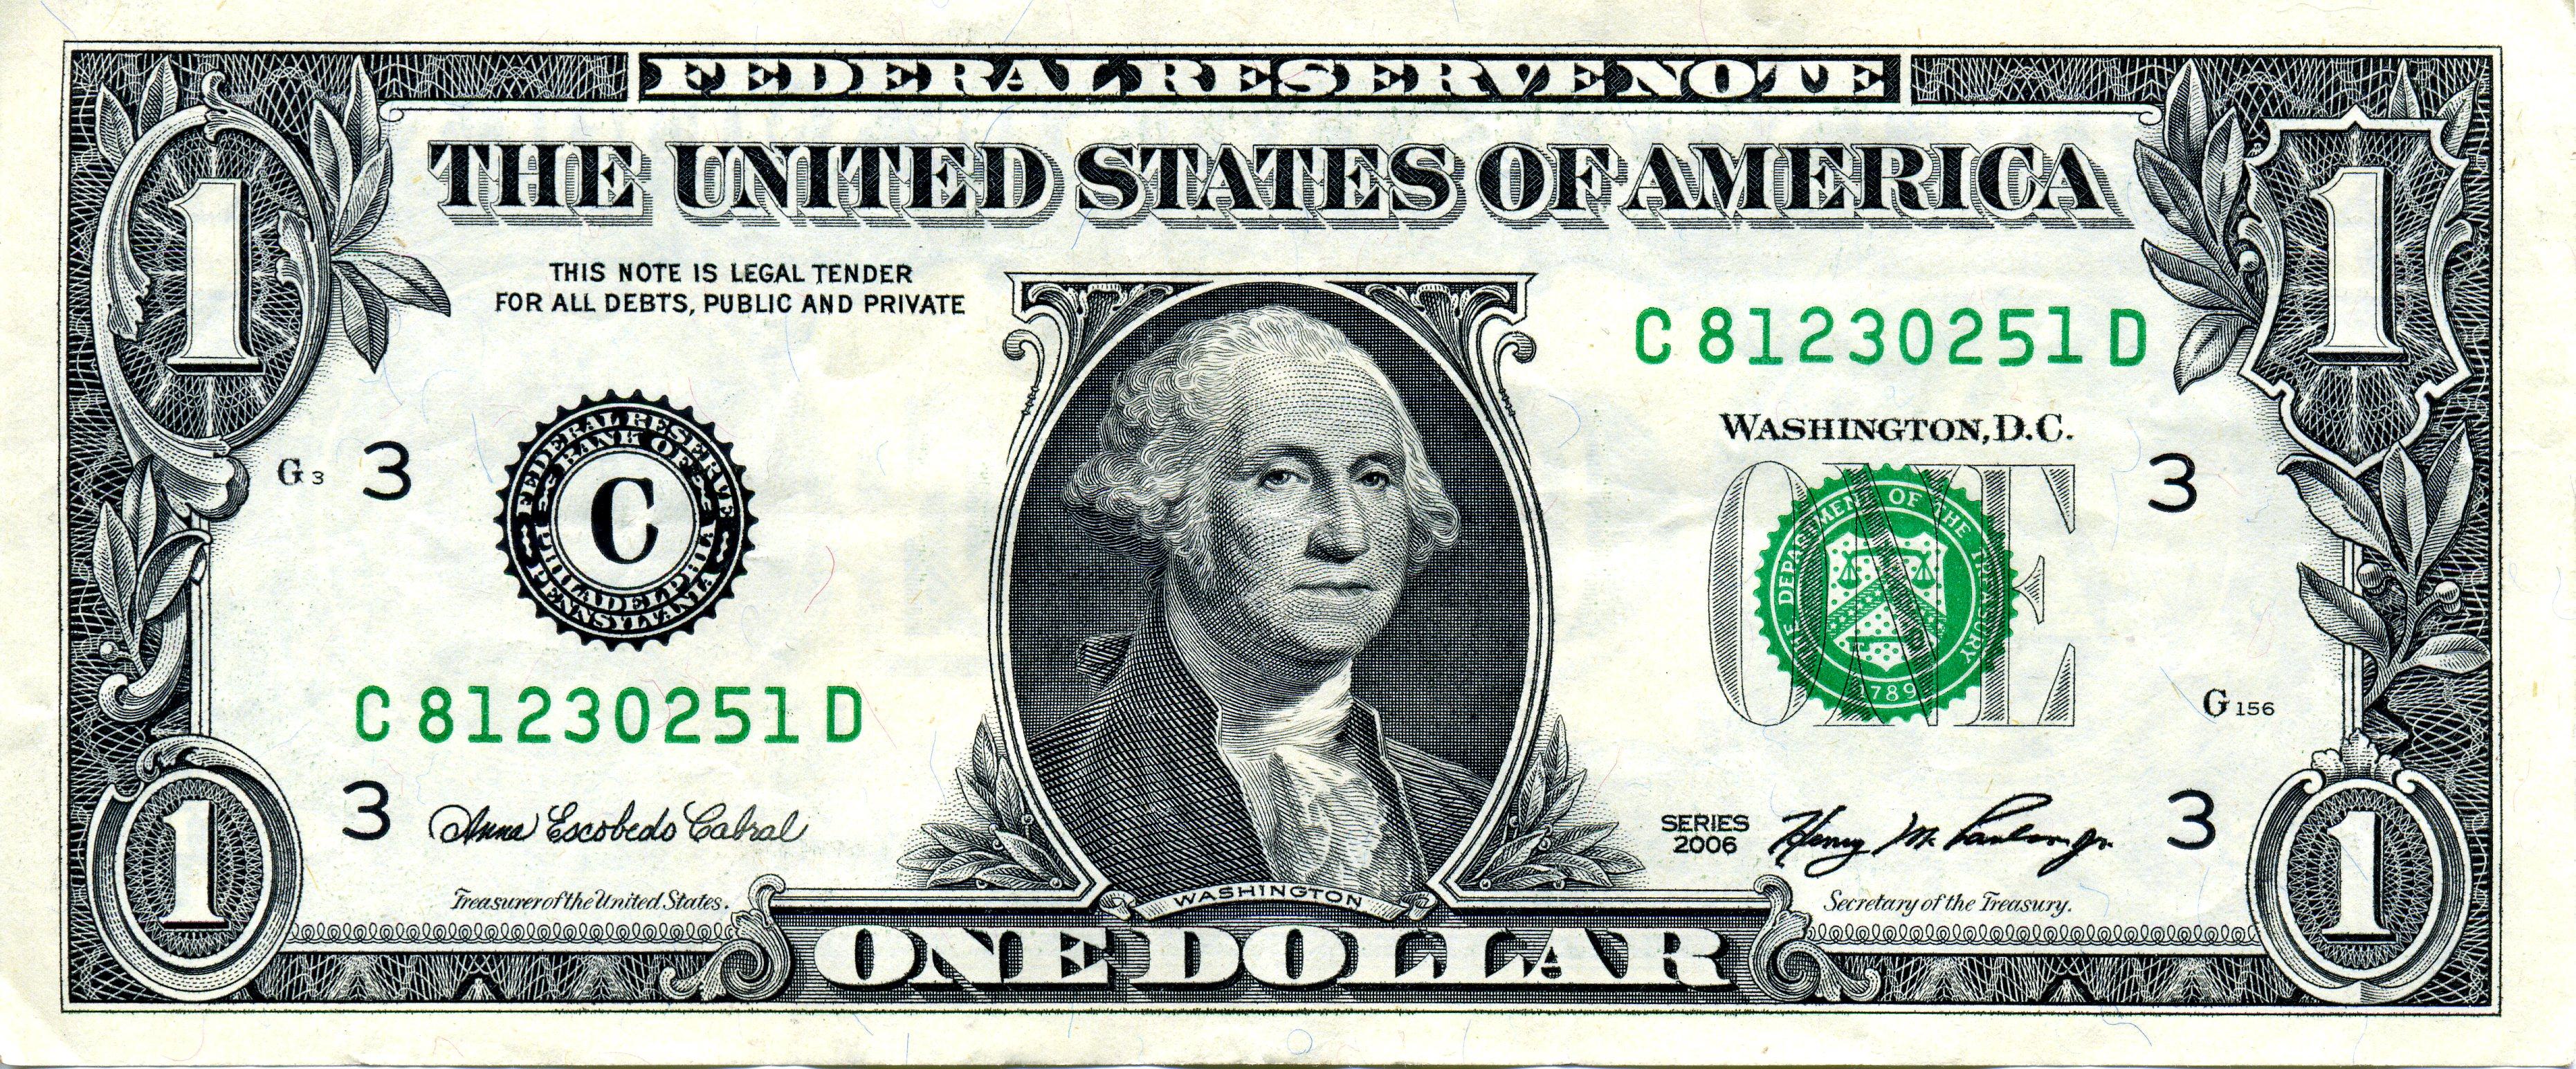 3723x1545 Drawing Of Dollar Bill Cartoon Stylized 100 Dollar Bill Caricature